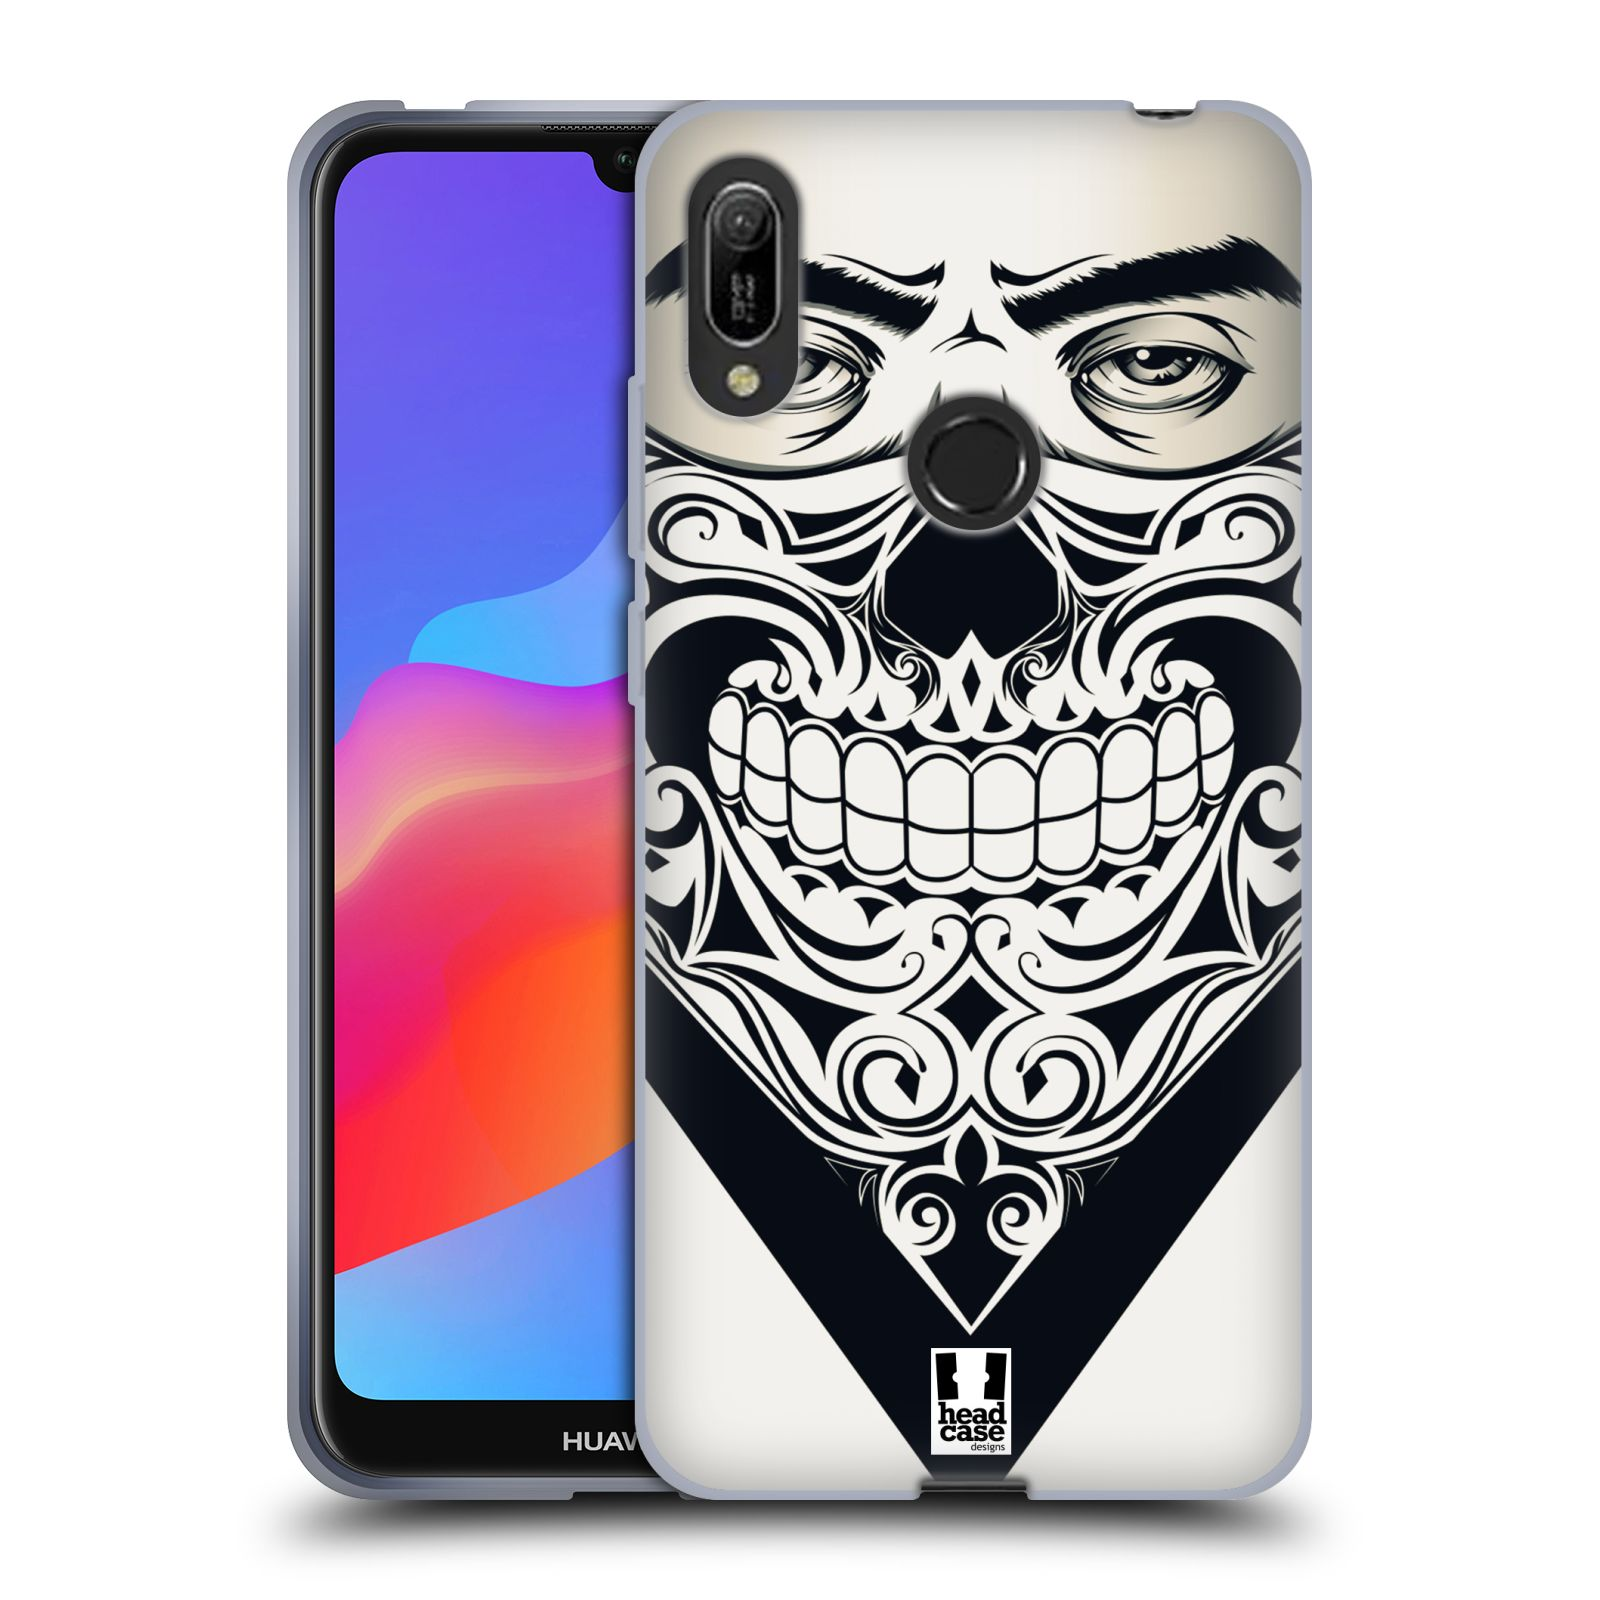 Silikonové pouzdro na mobil Huawei Y6 (2019) - Head Case - LEBKA BANDANA